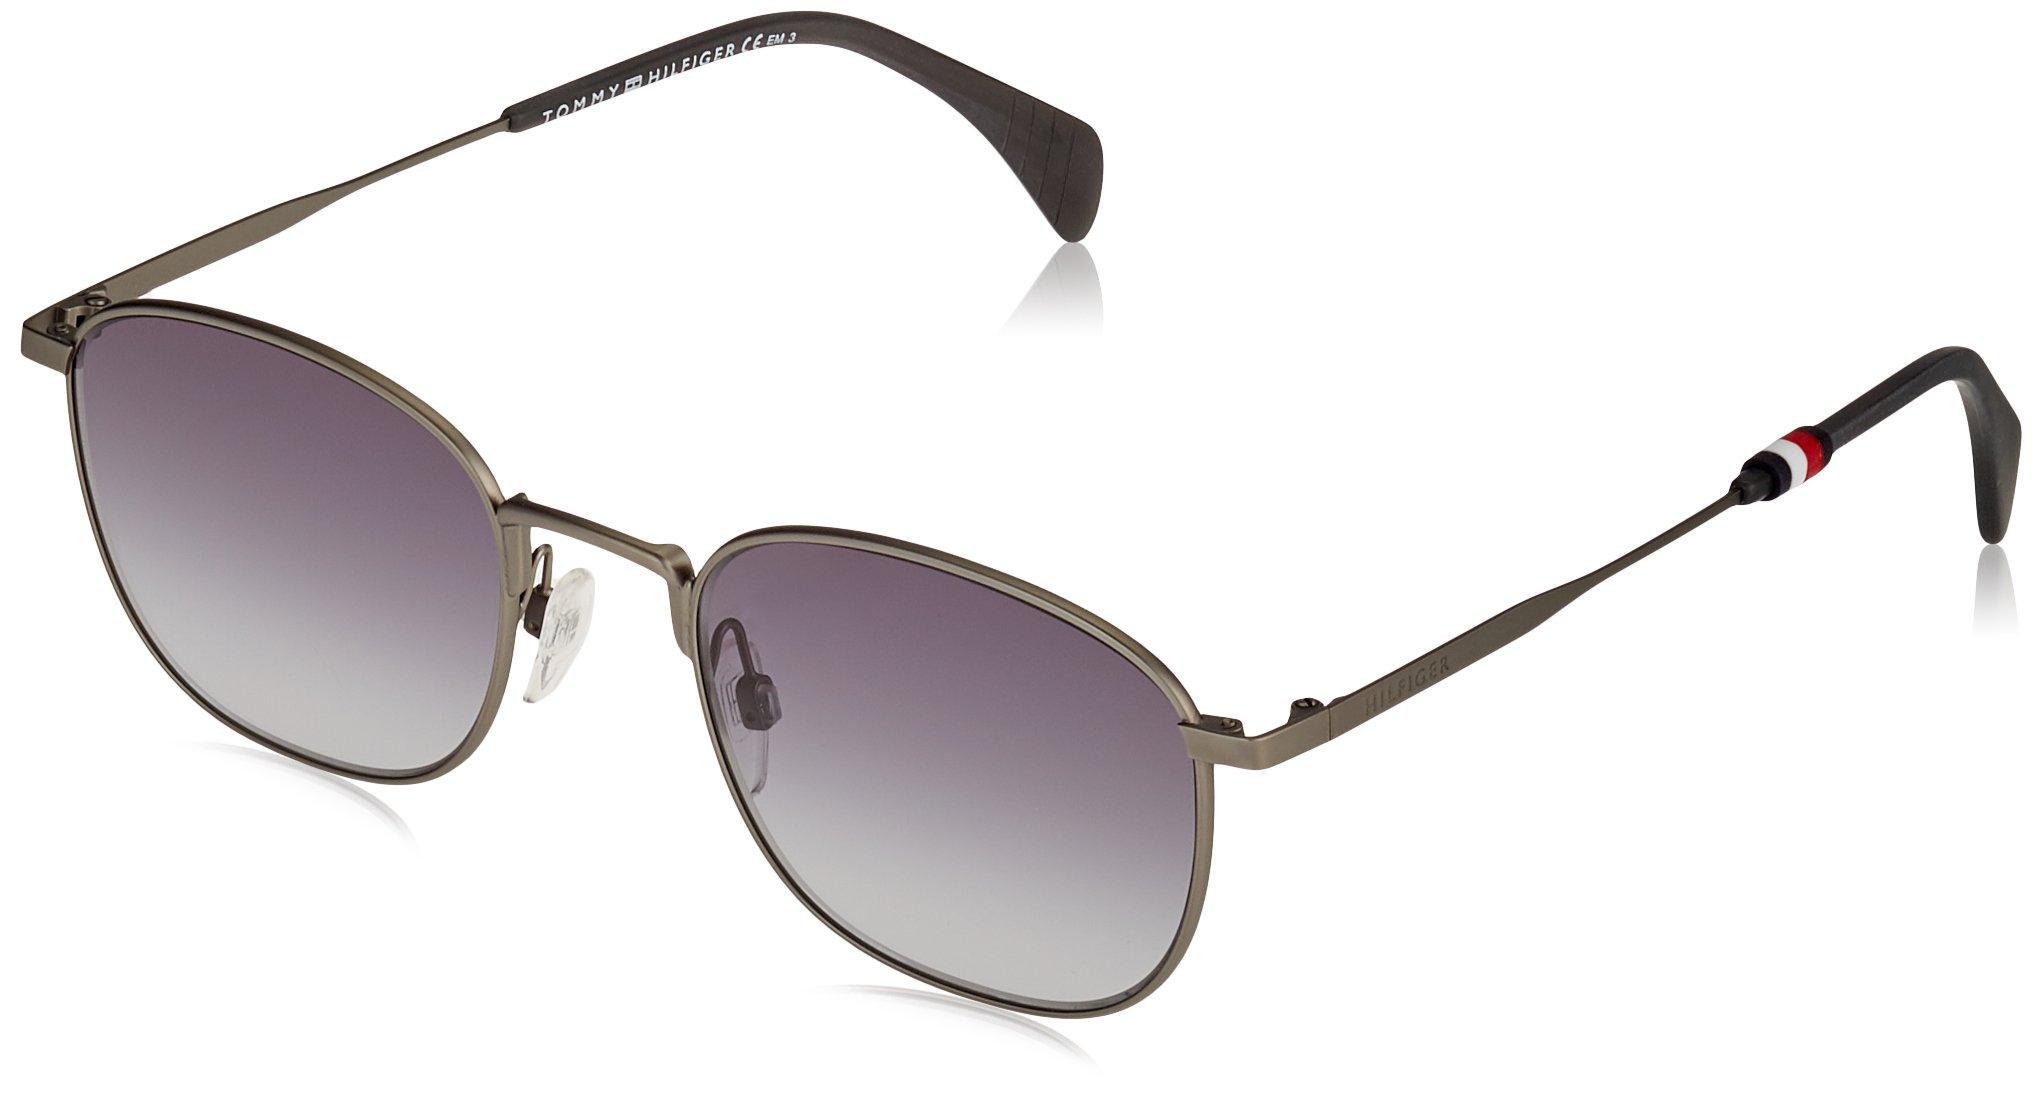 Tommy Hilfiger Metal Rectangular Sunglasses 52 0R80 Semi Matte Dark Ruthenium 9O dark gray gradient lens by Tommy Hilfiger